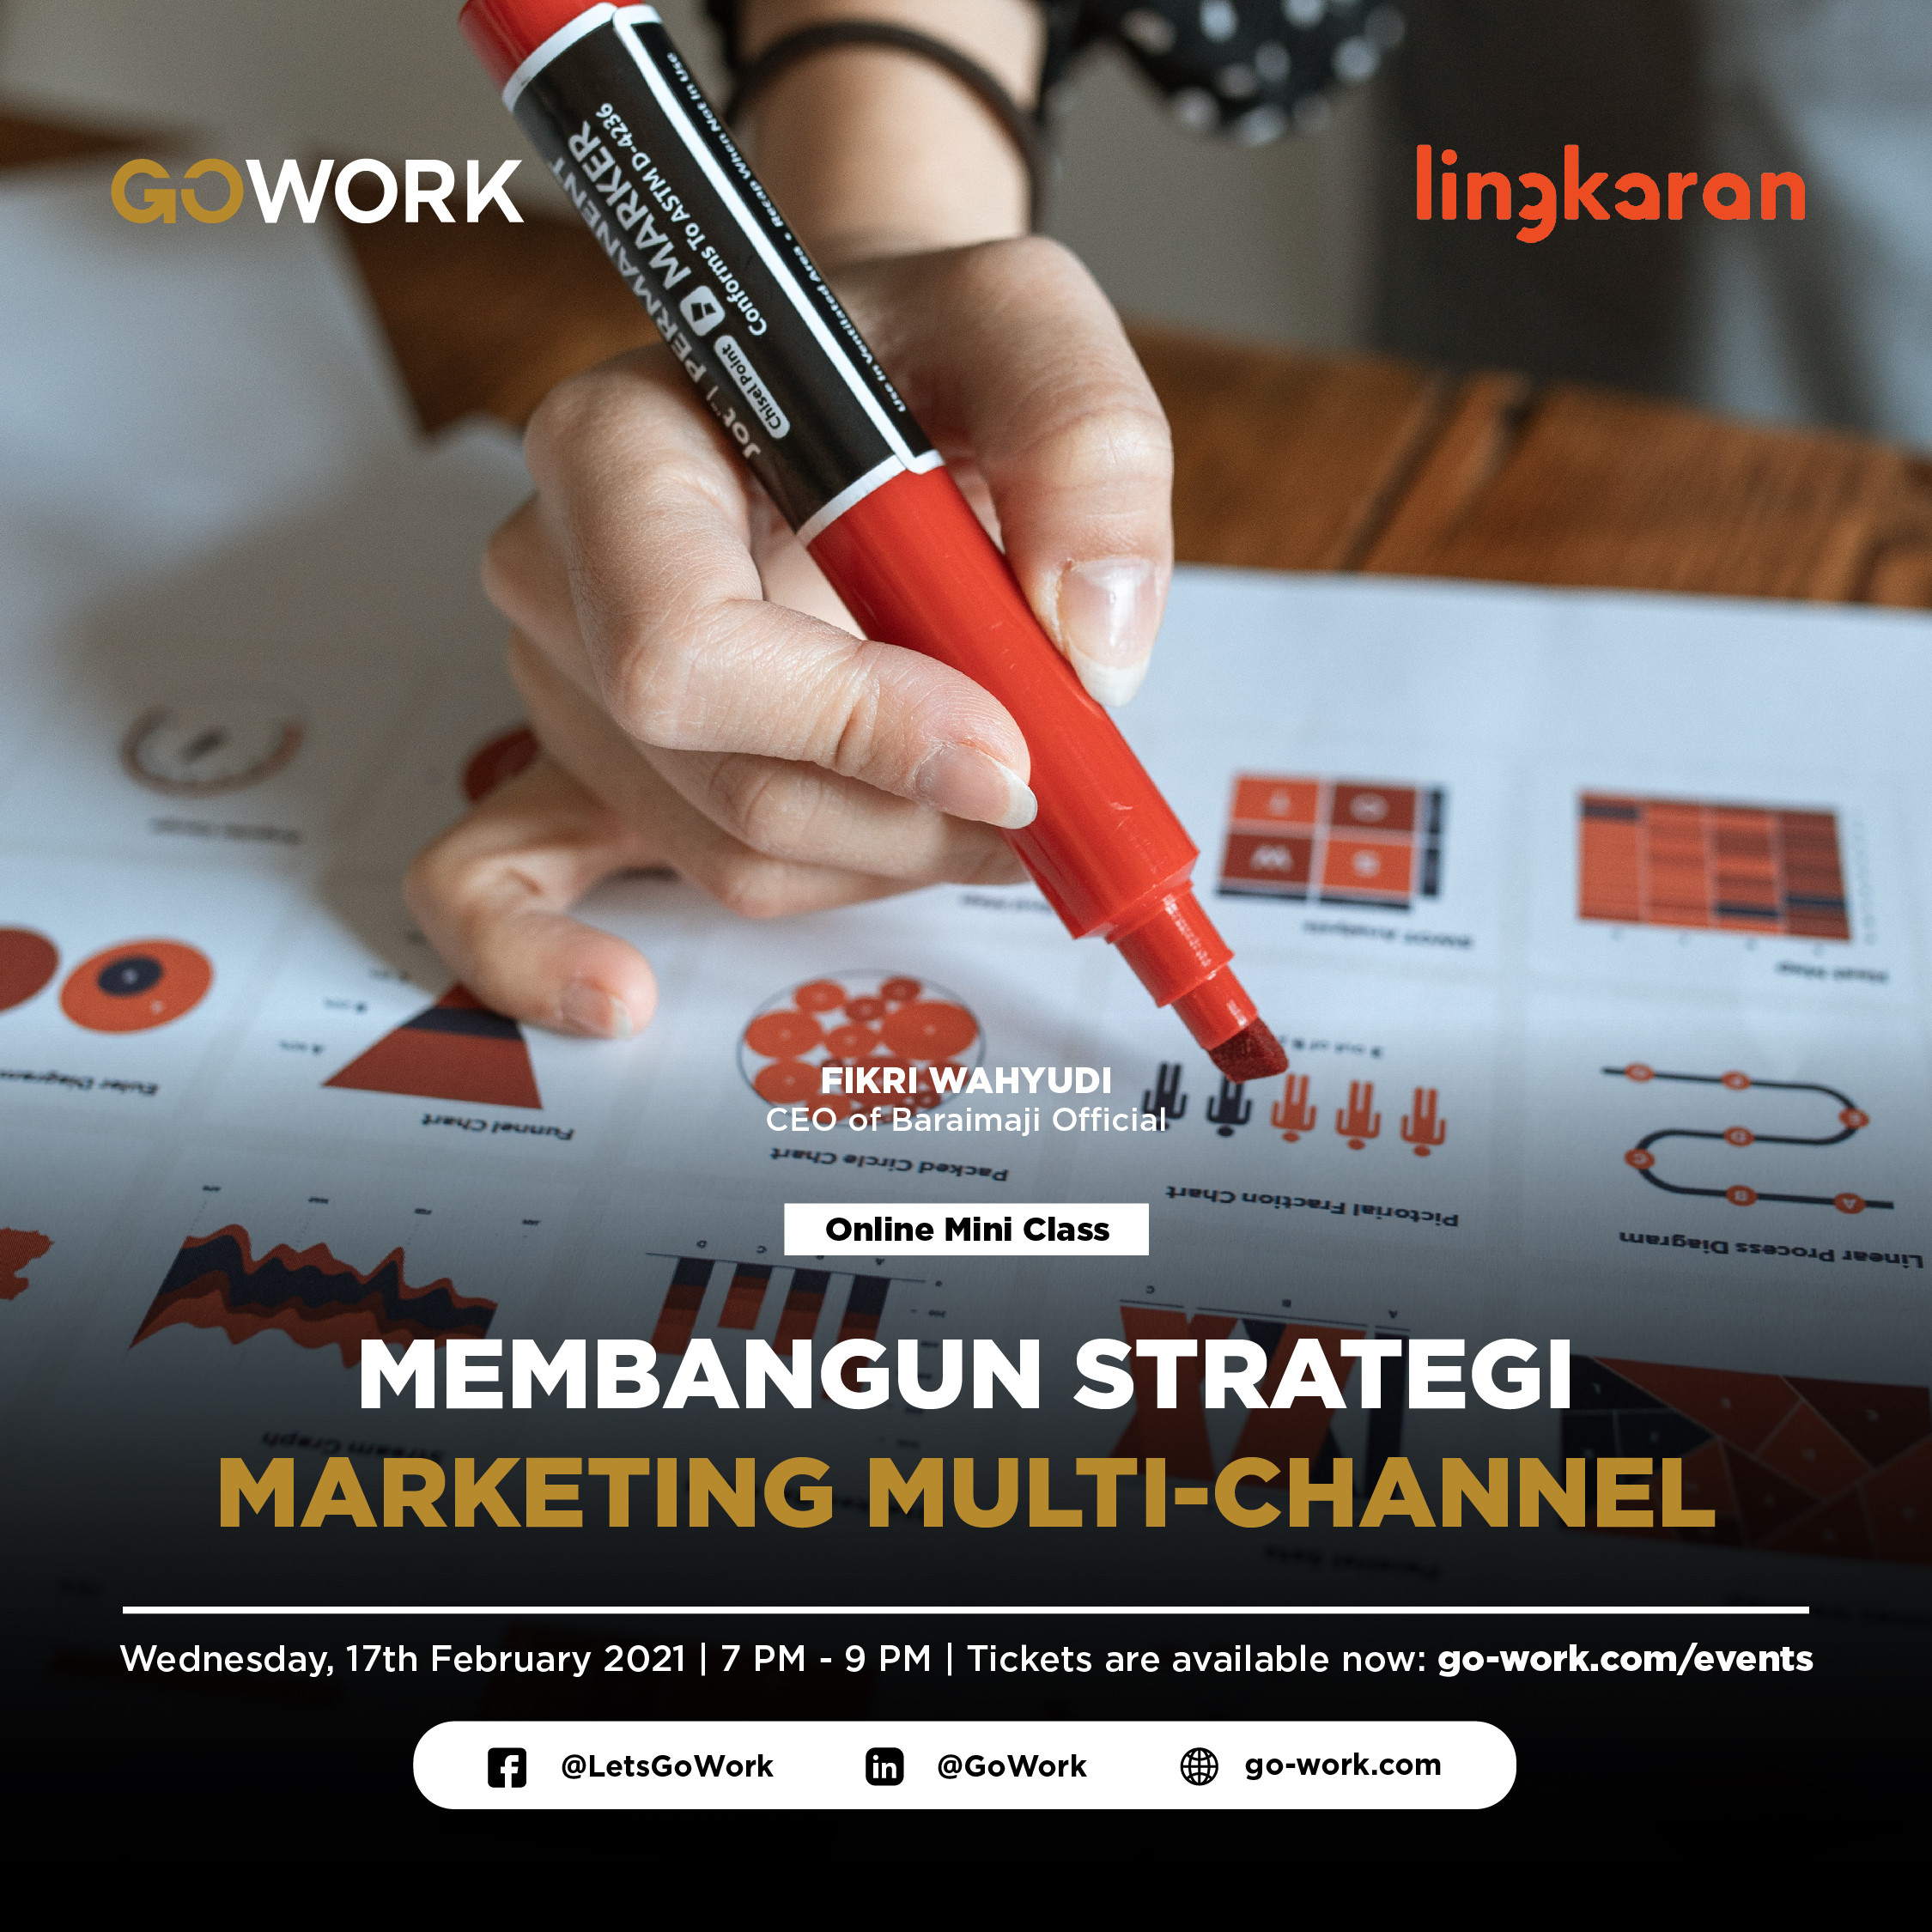 Membangun Strategi Marketing Multi-Channel